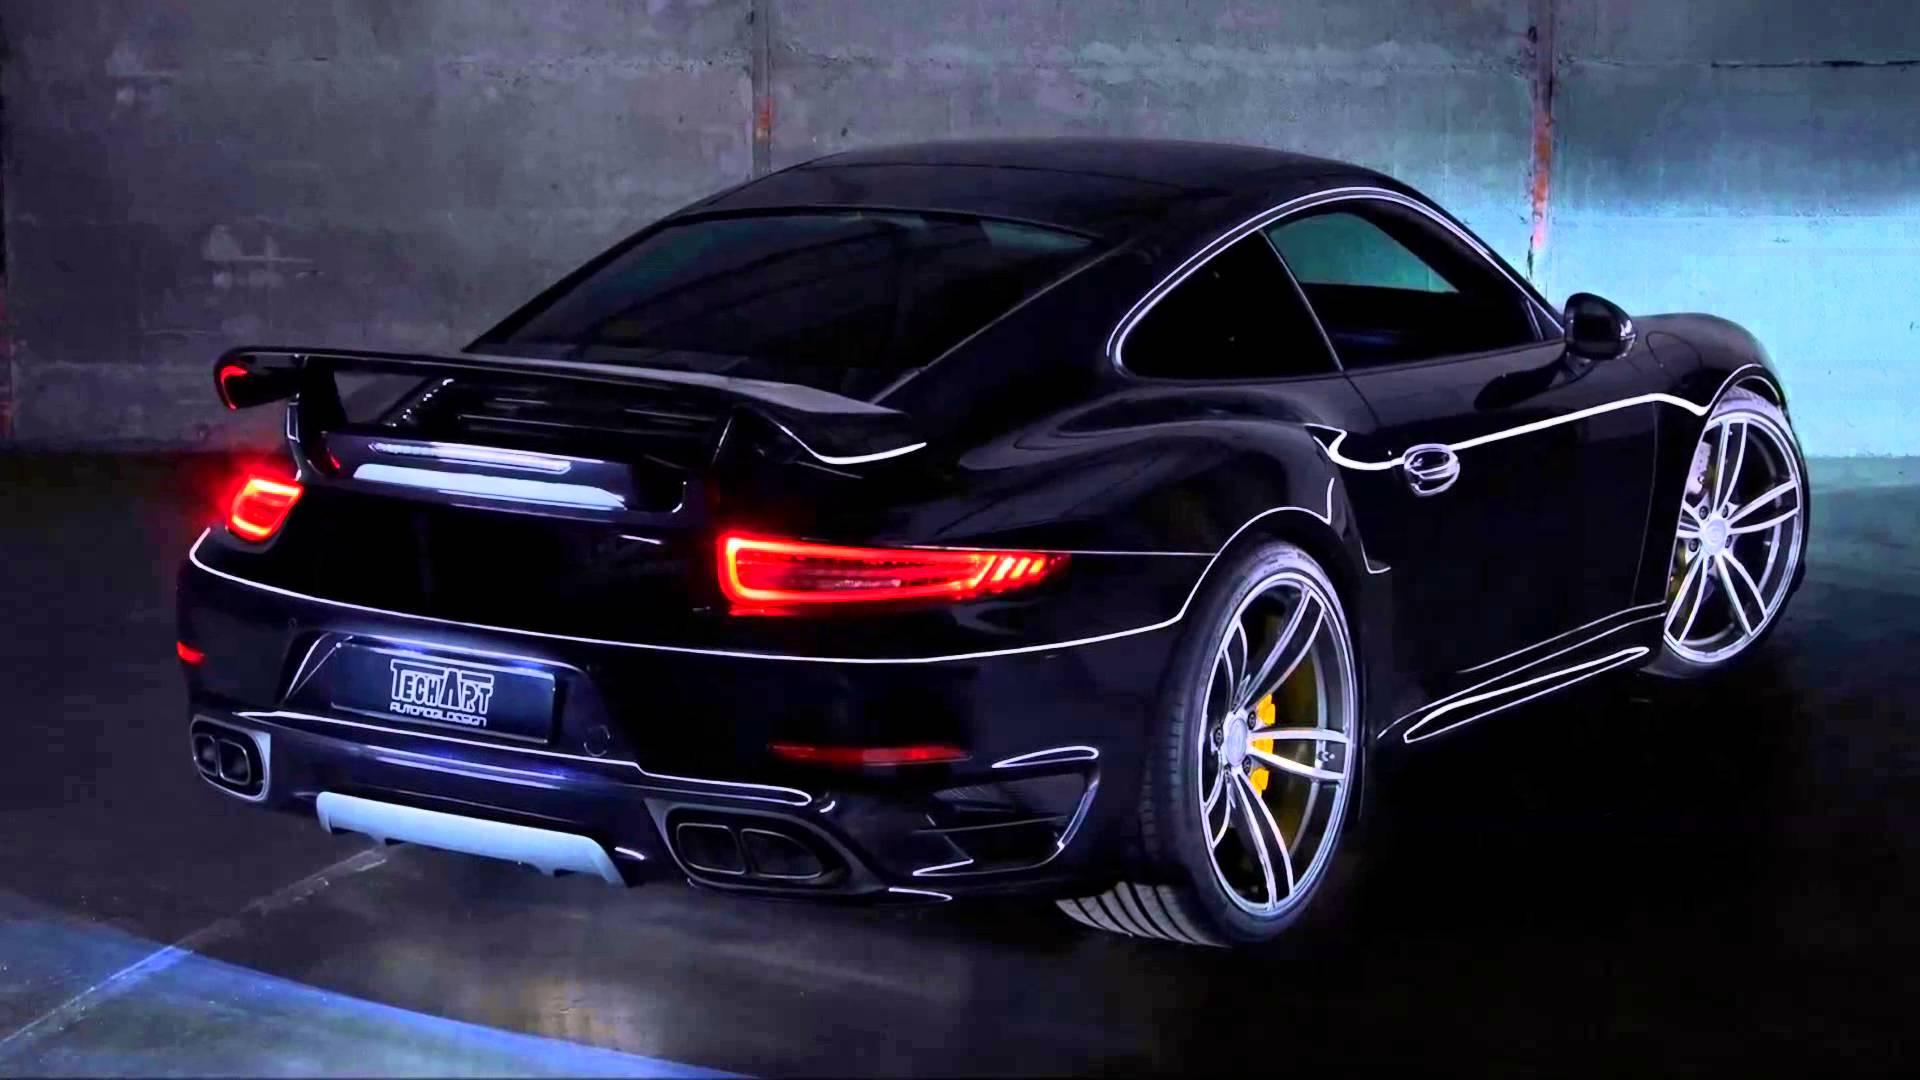 High Resolution Porsche 911 Turbo S Wallpapers, Artemidoros Ind